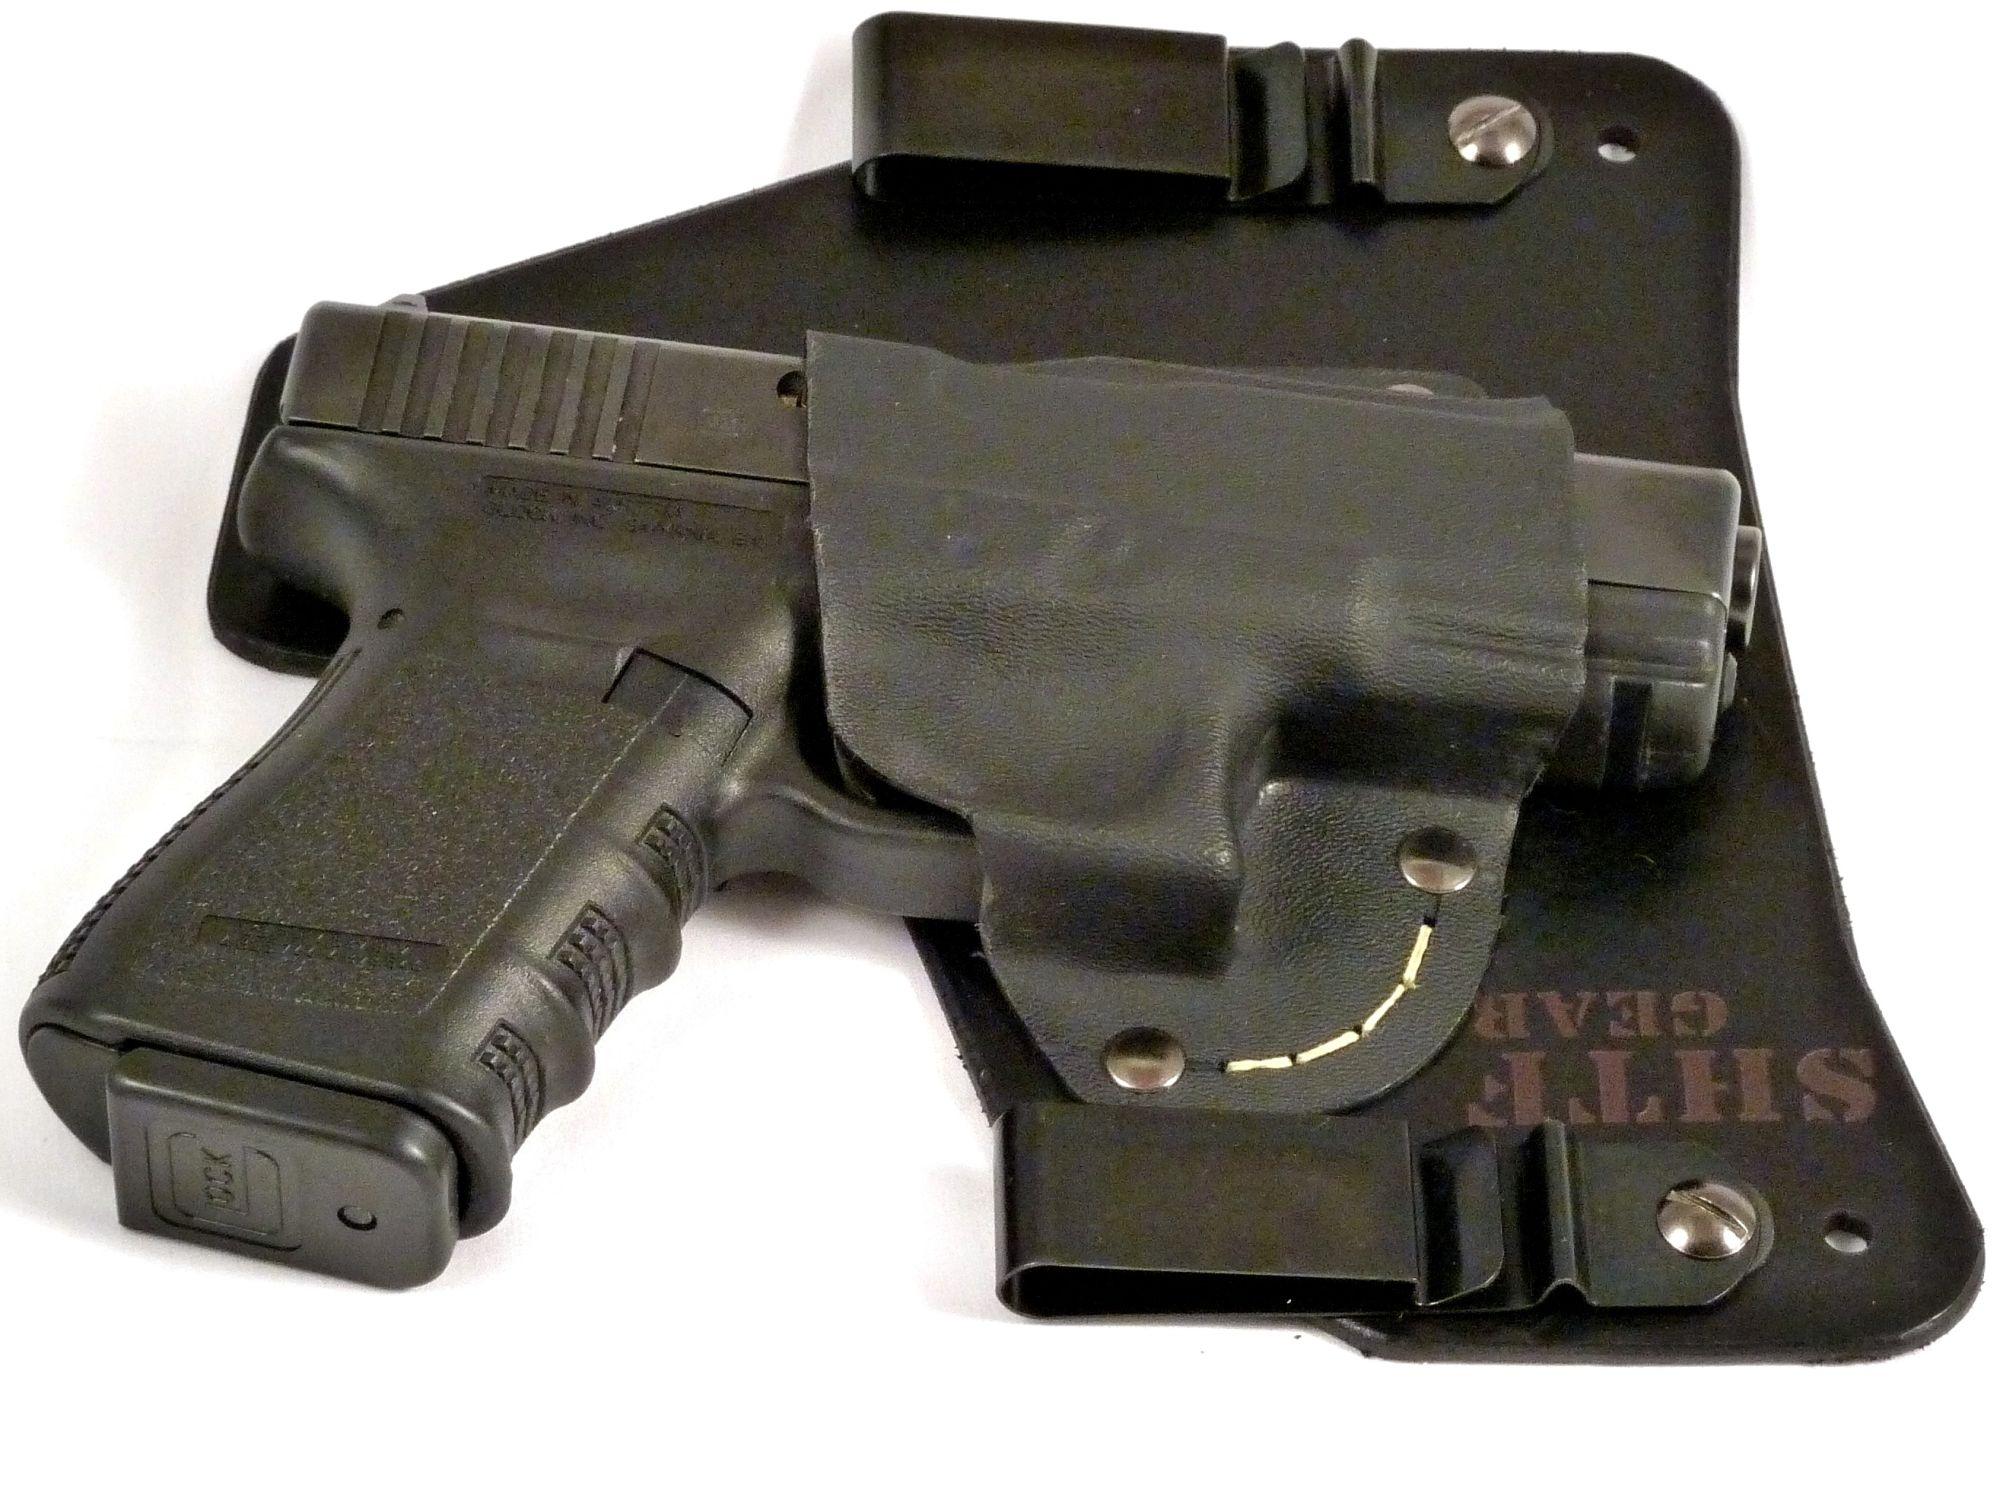 Help me spend my money! (gun belt & IWB holster recs please)-glock-gun-left-2000.jpg